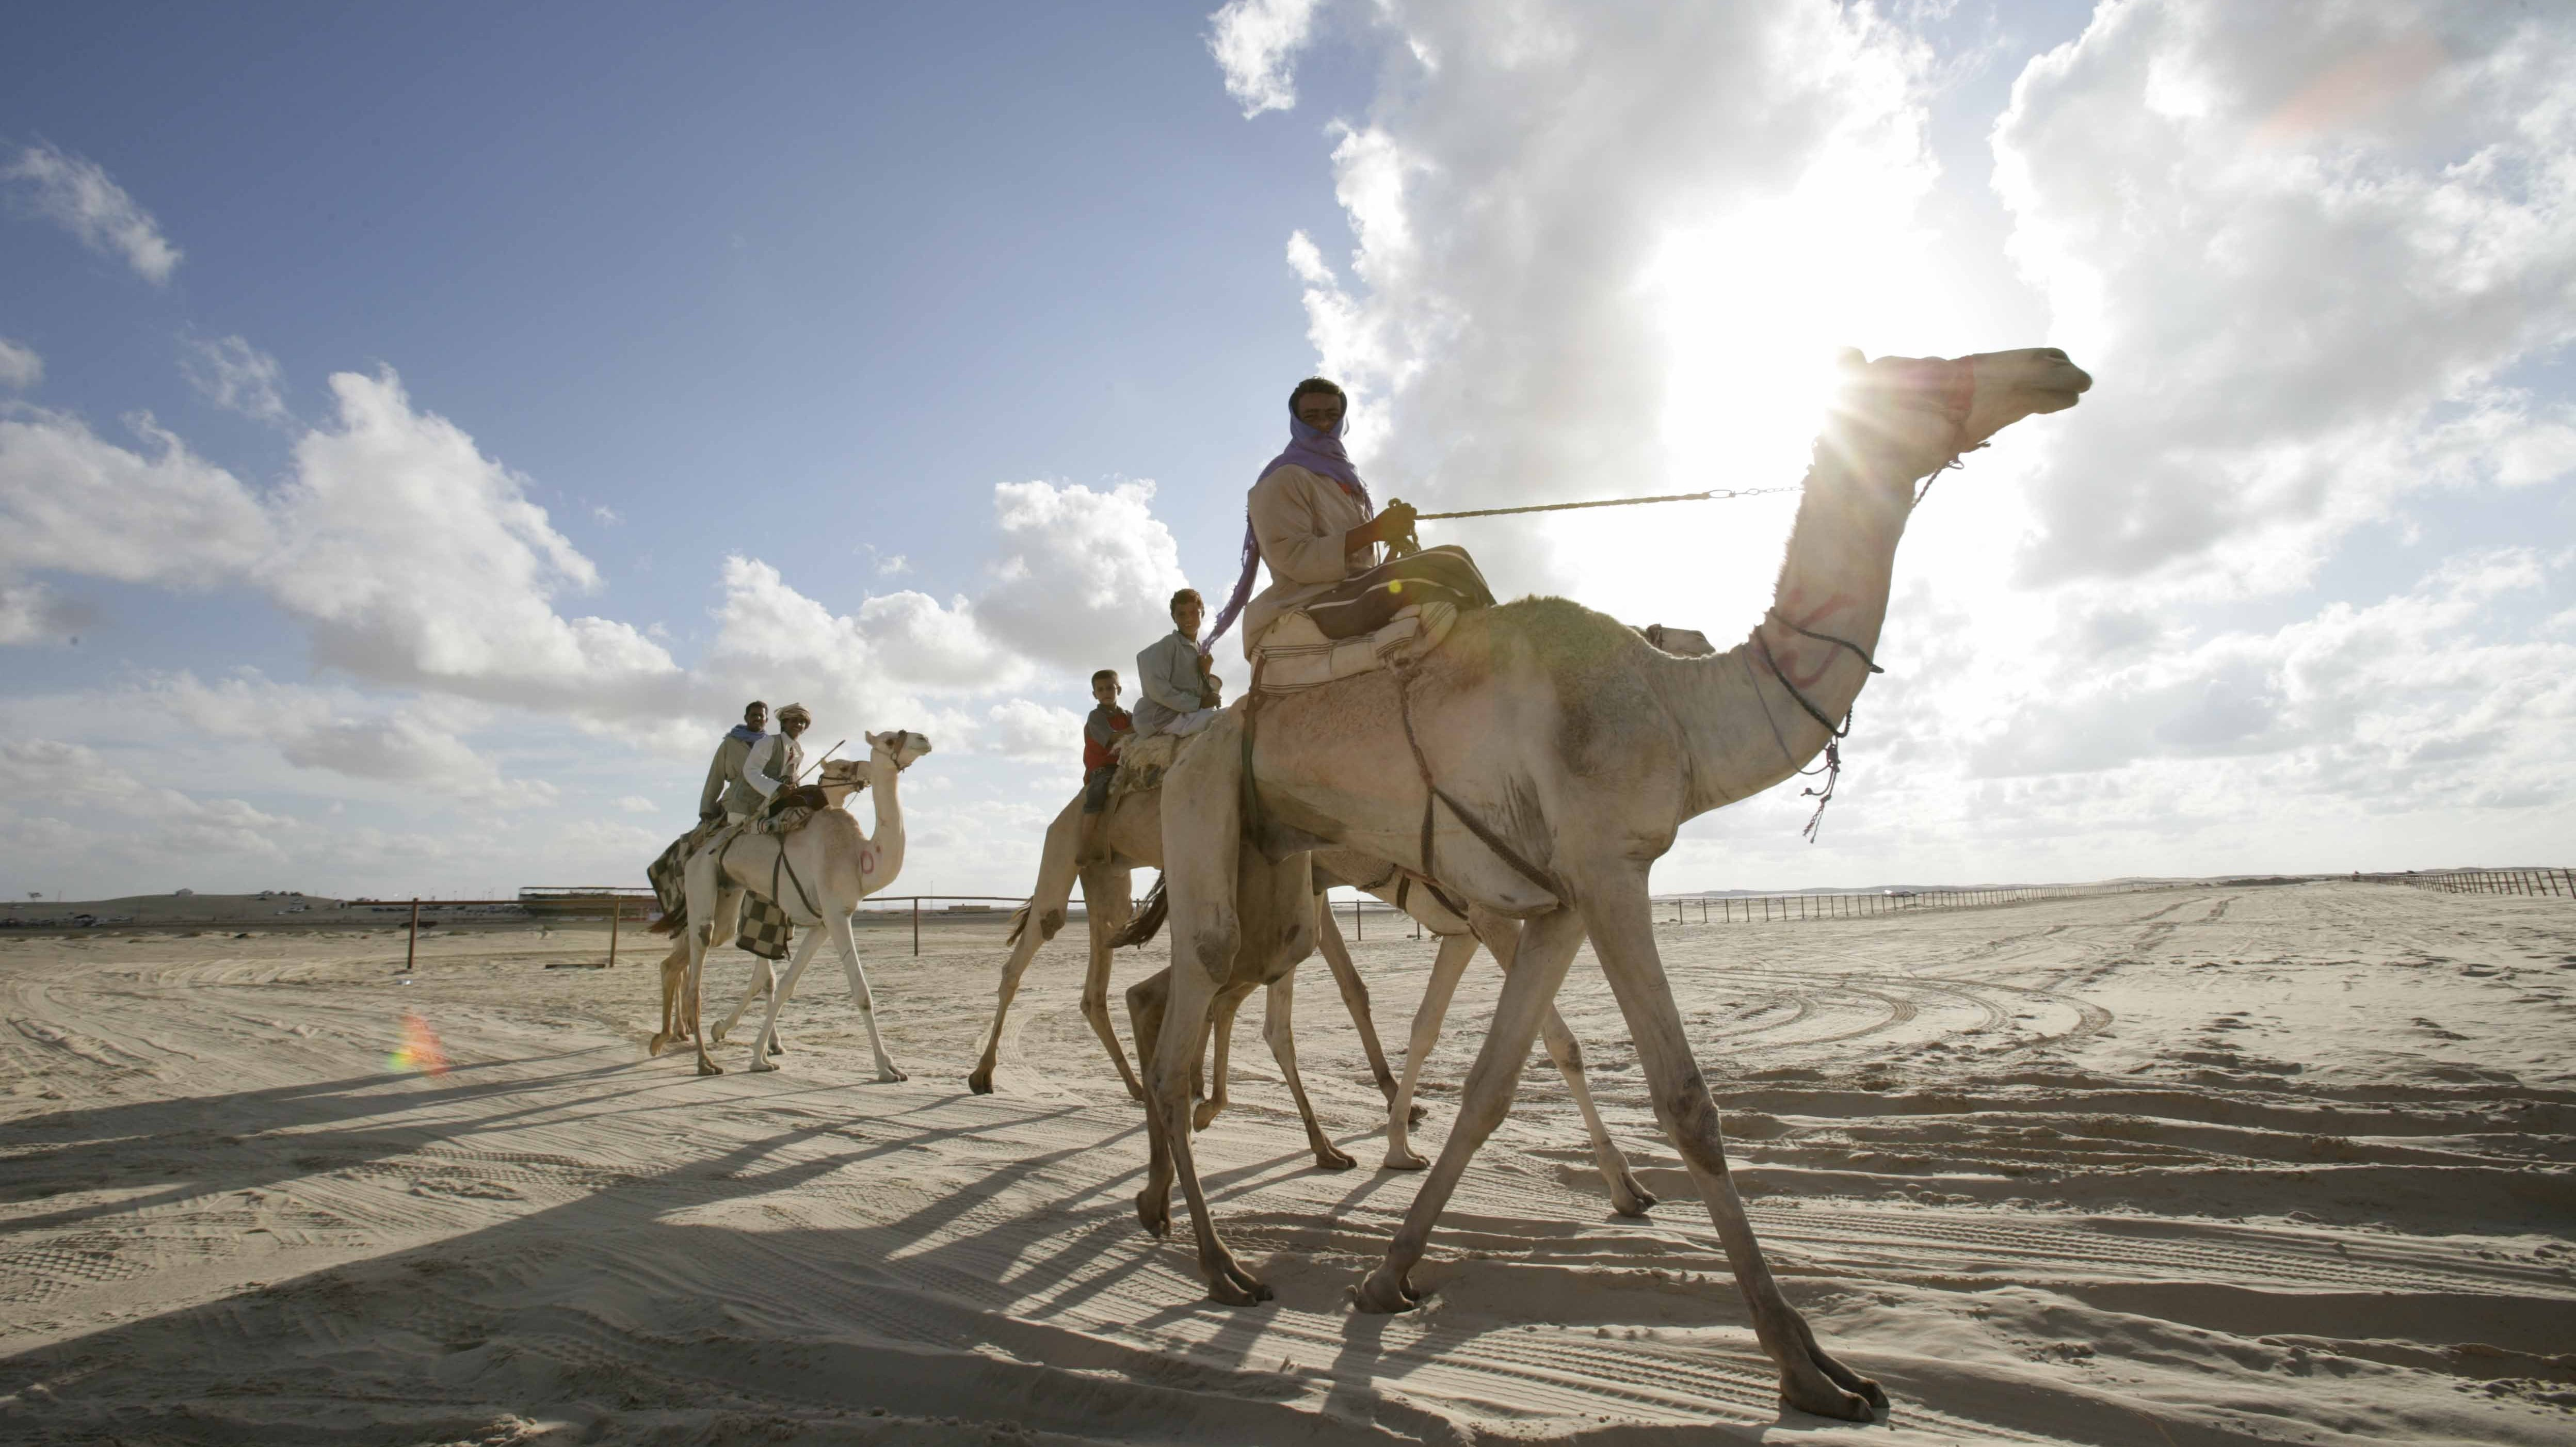 Watch MERS Virus Found in Air in Camel Barn video